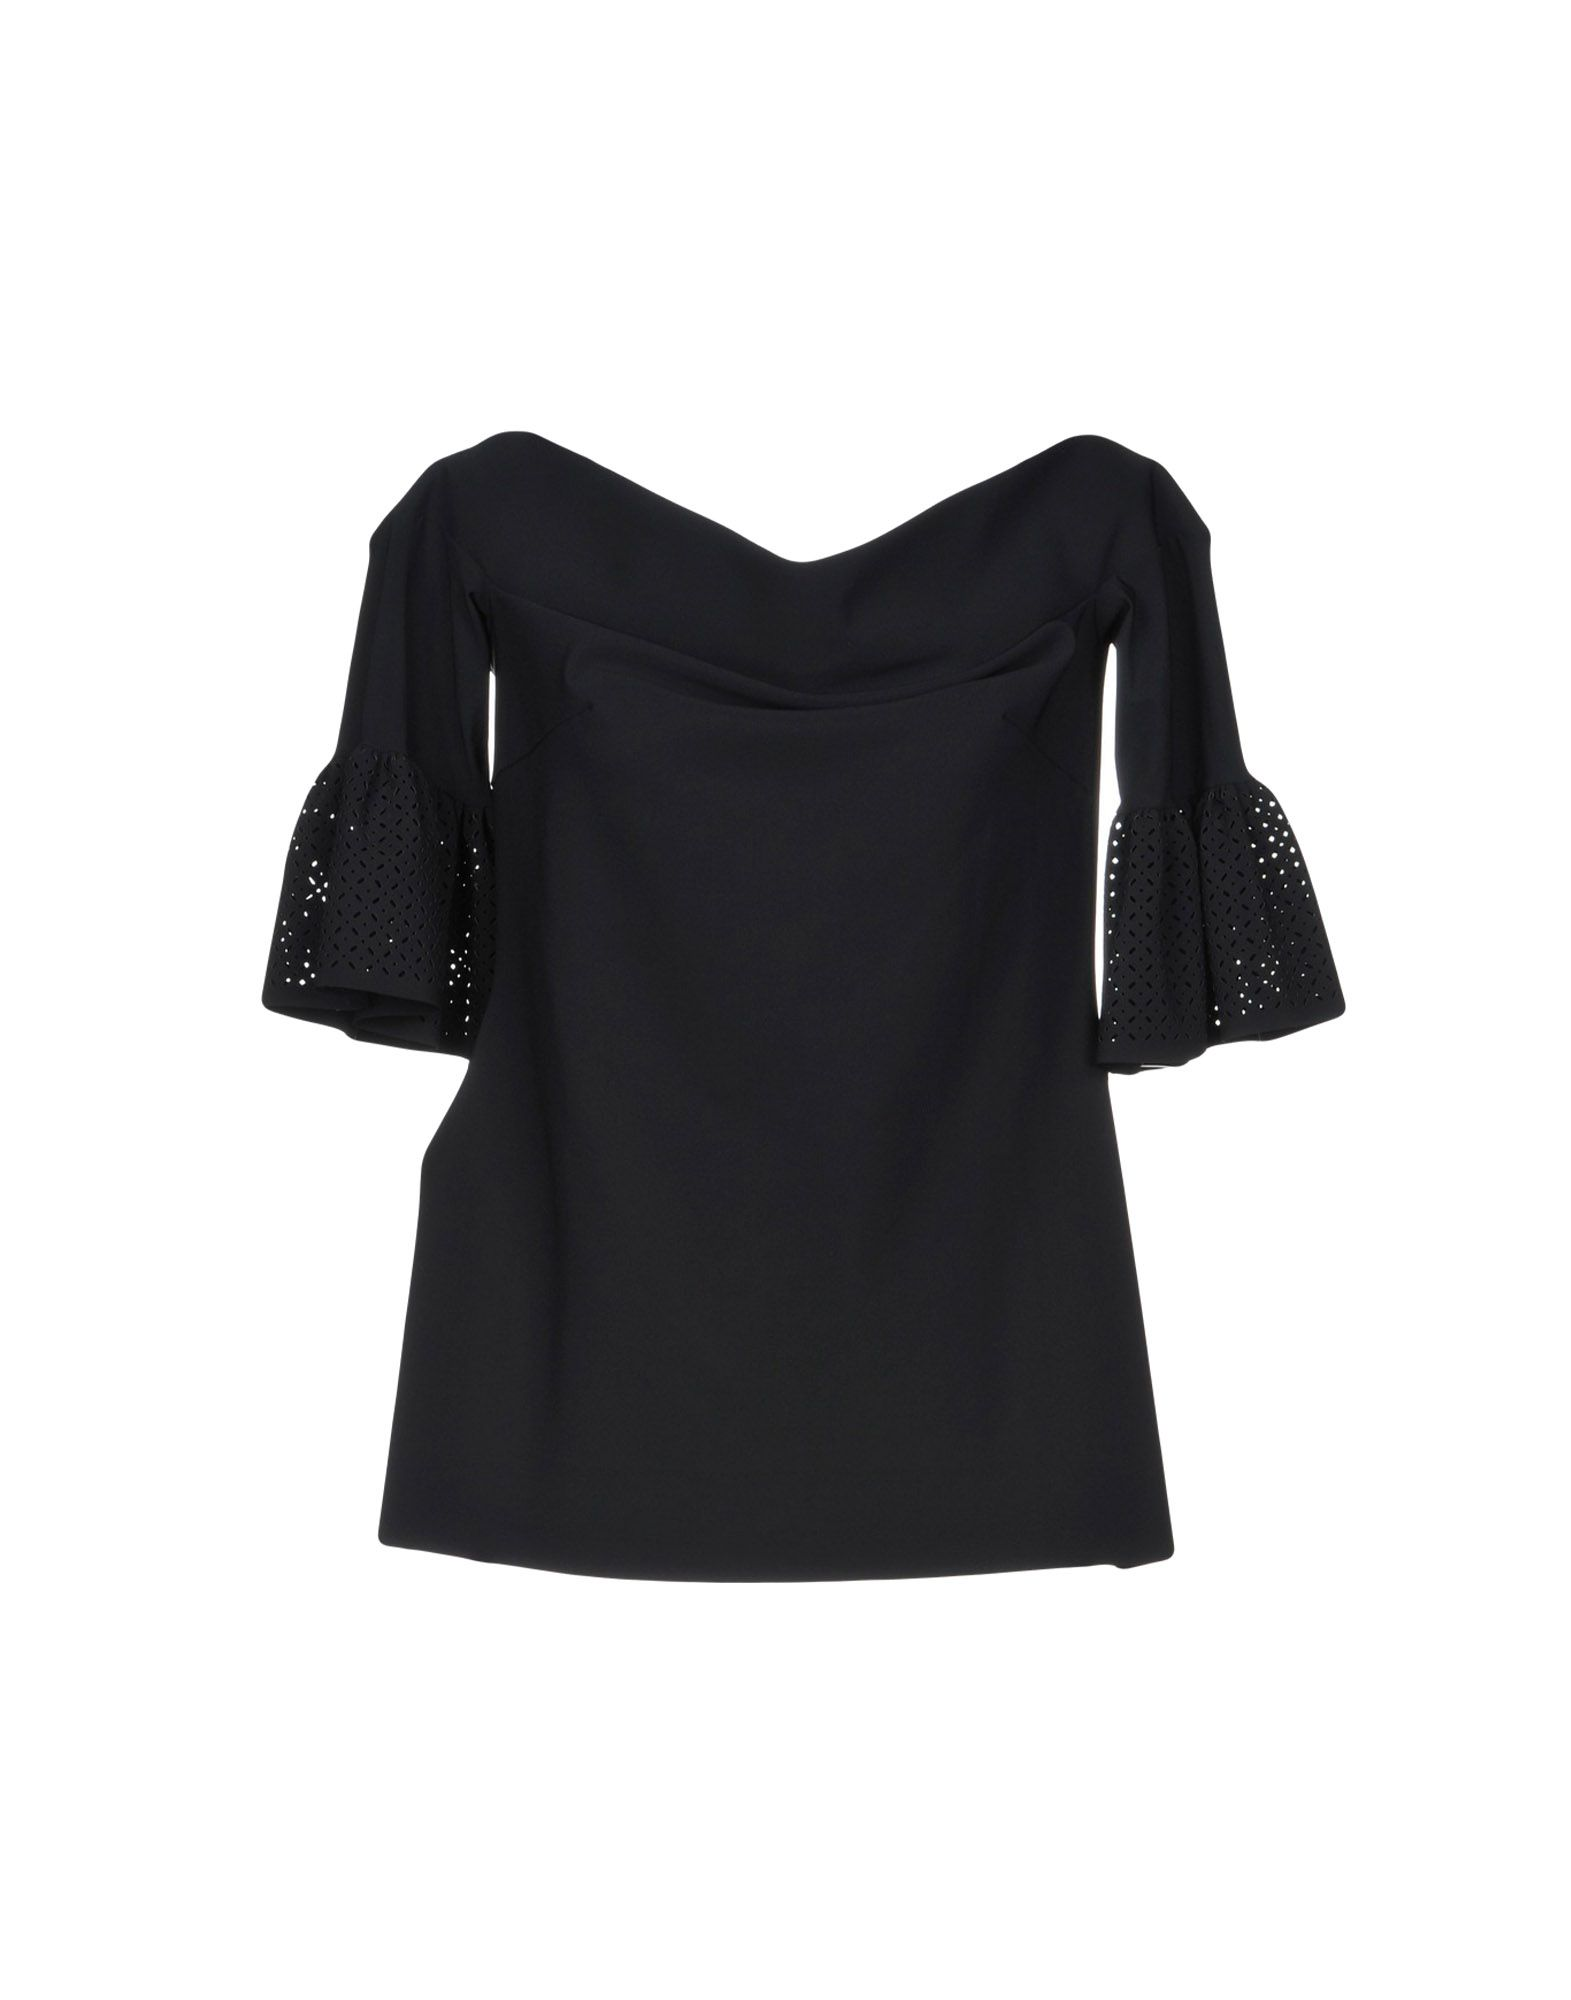 CHIARA BONI LA PETITE ROBE Блузка chiara boni la petite robe повседневные брюки